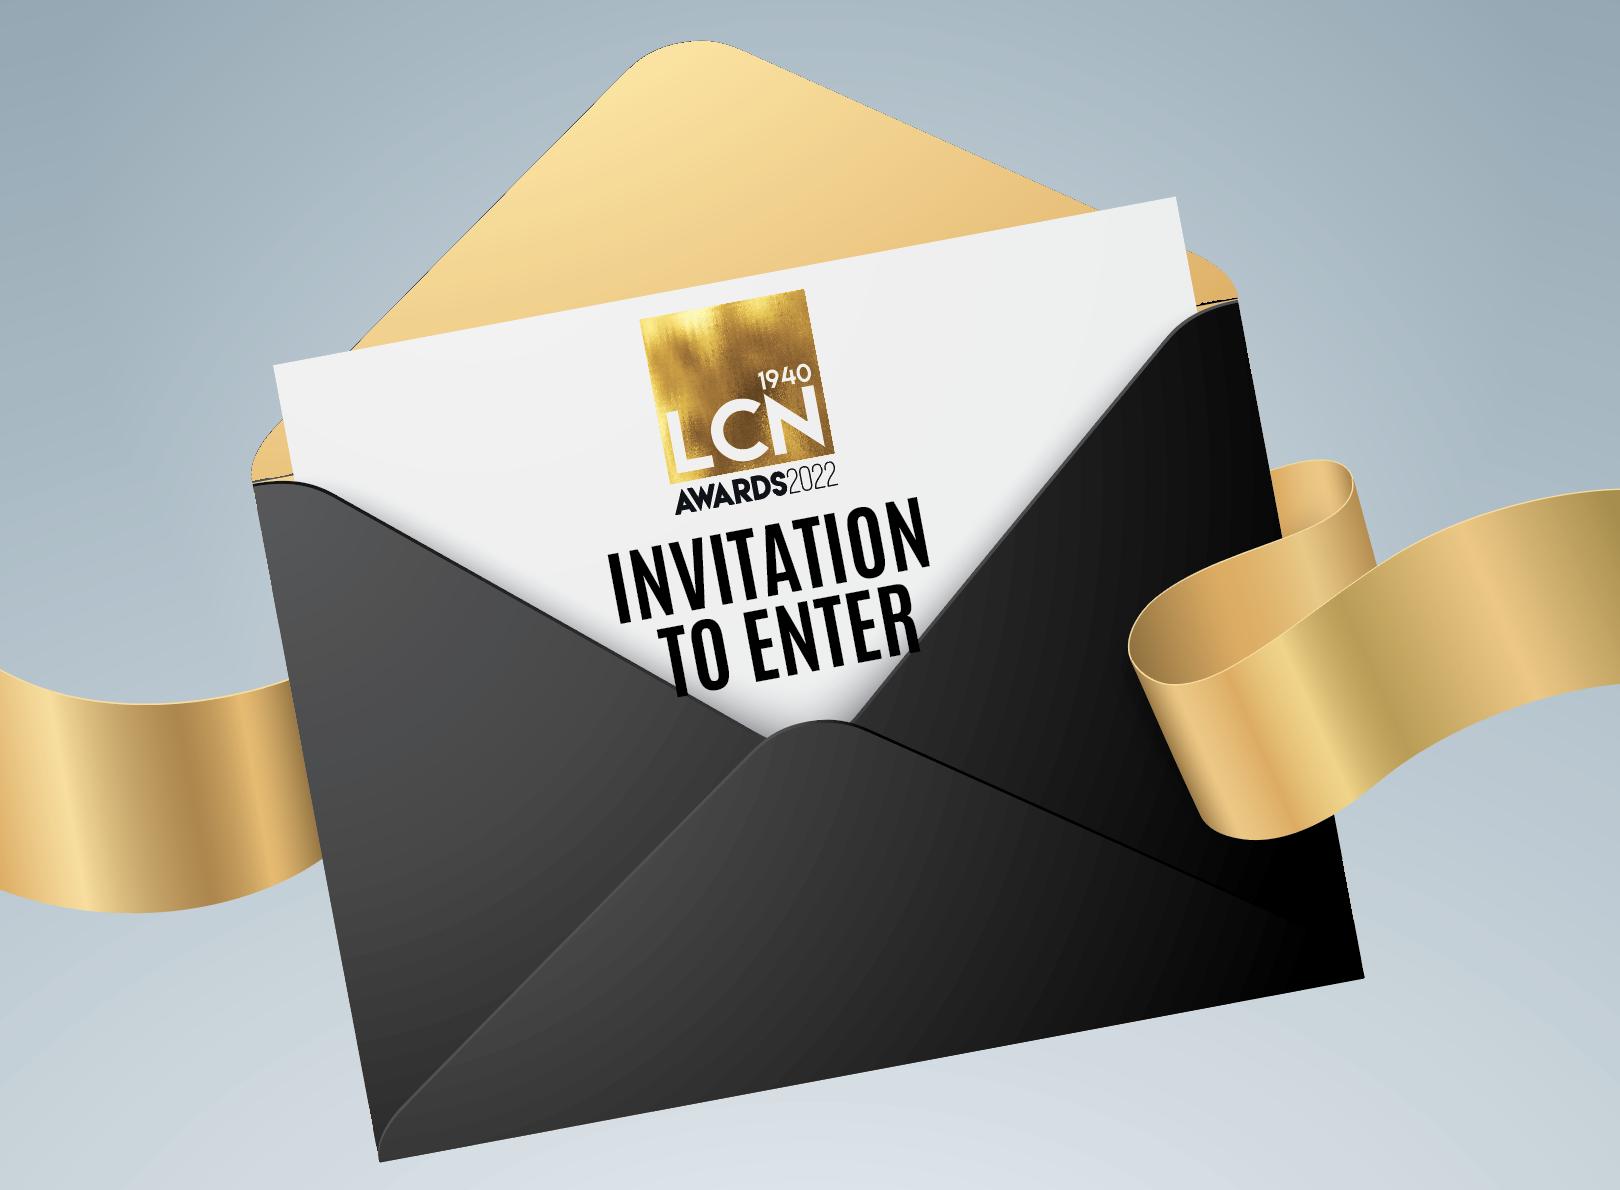 LCN Awards 2022 ENTRY FORM